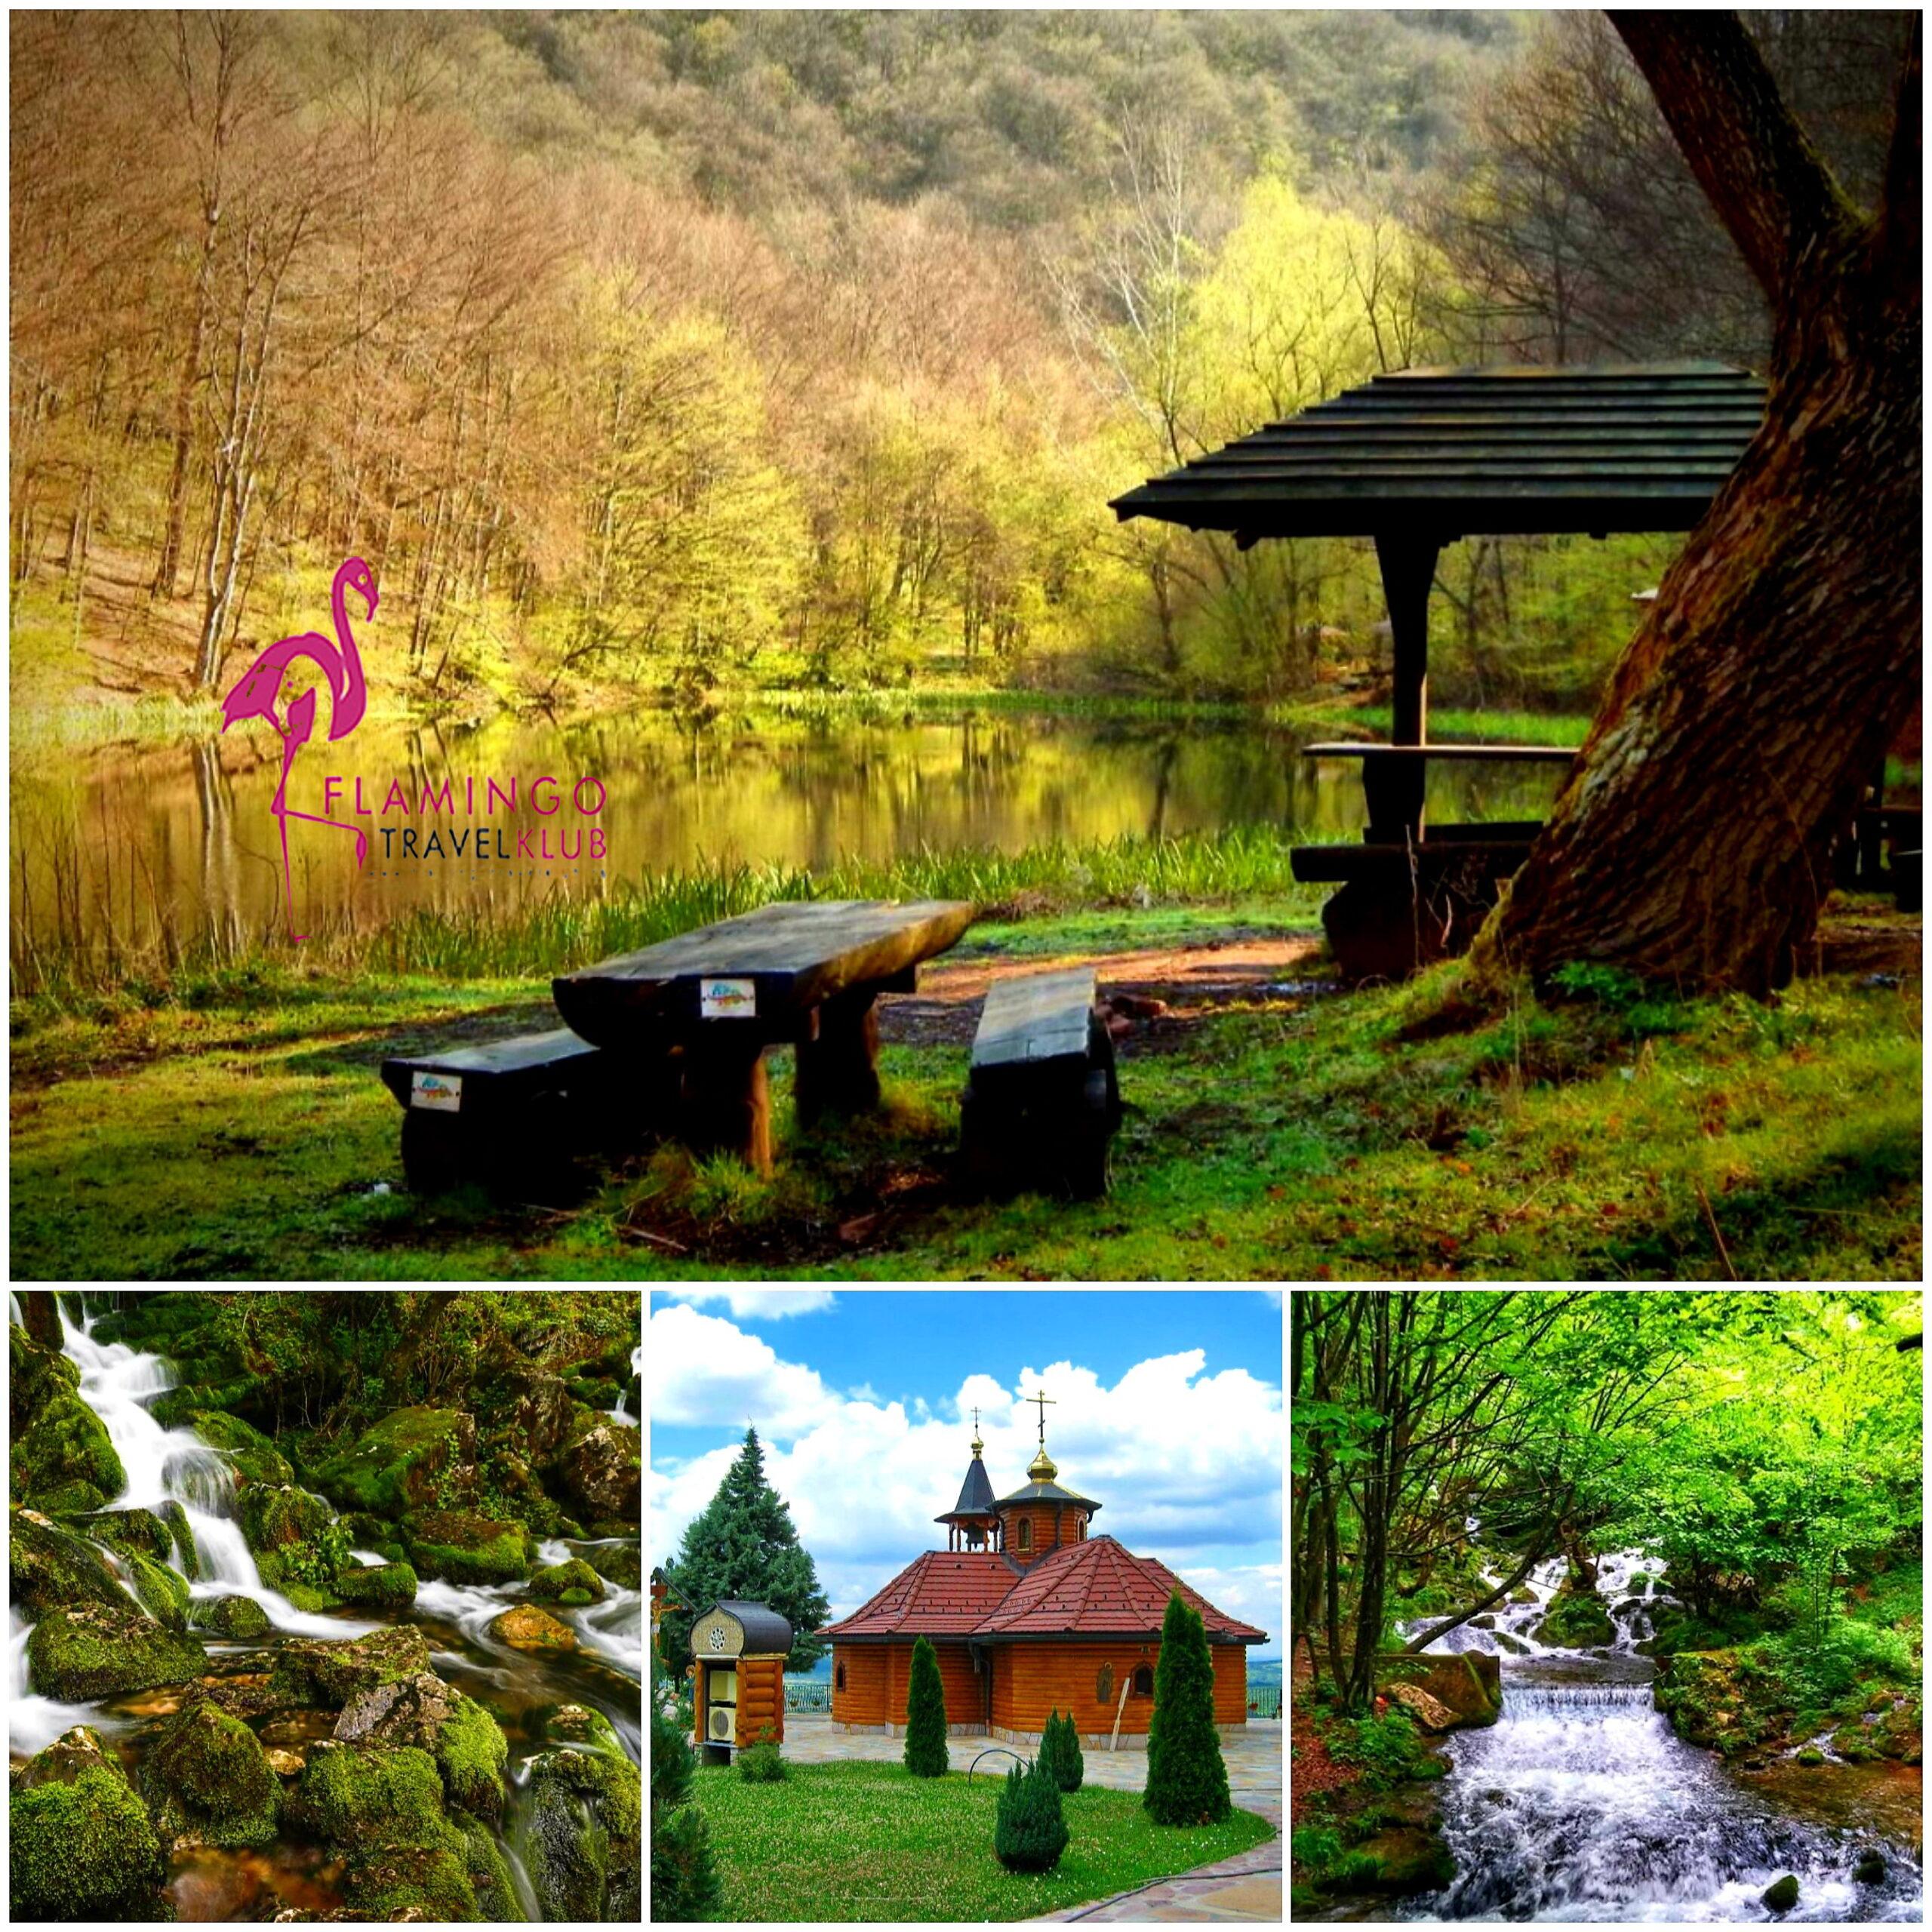 grza i manastir lesje izlet